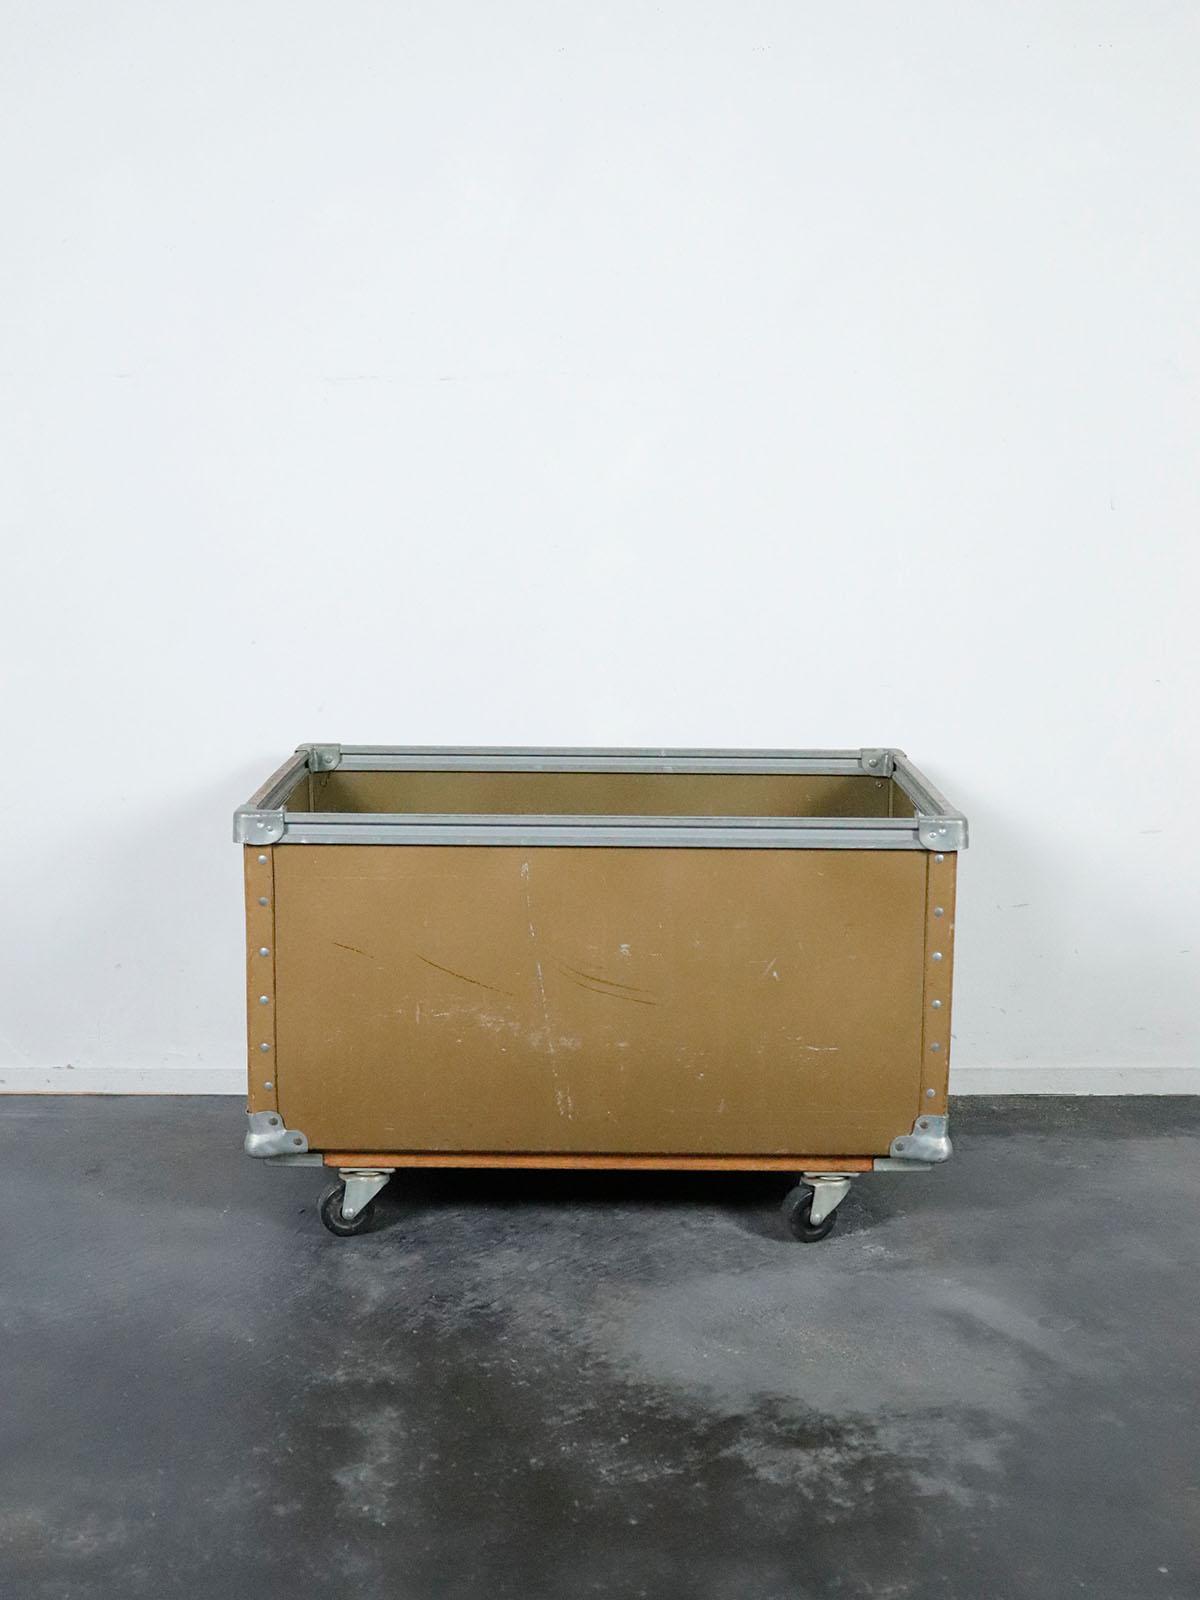 fiber,box cart,vintage,usa